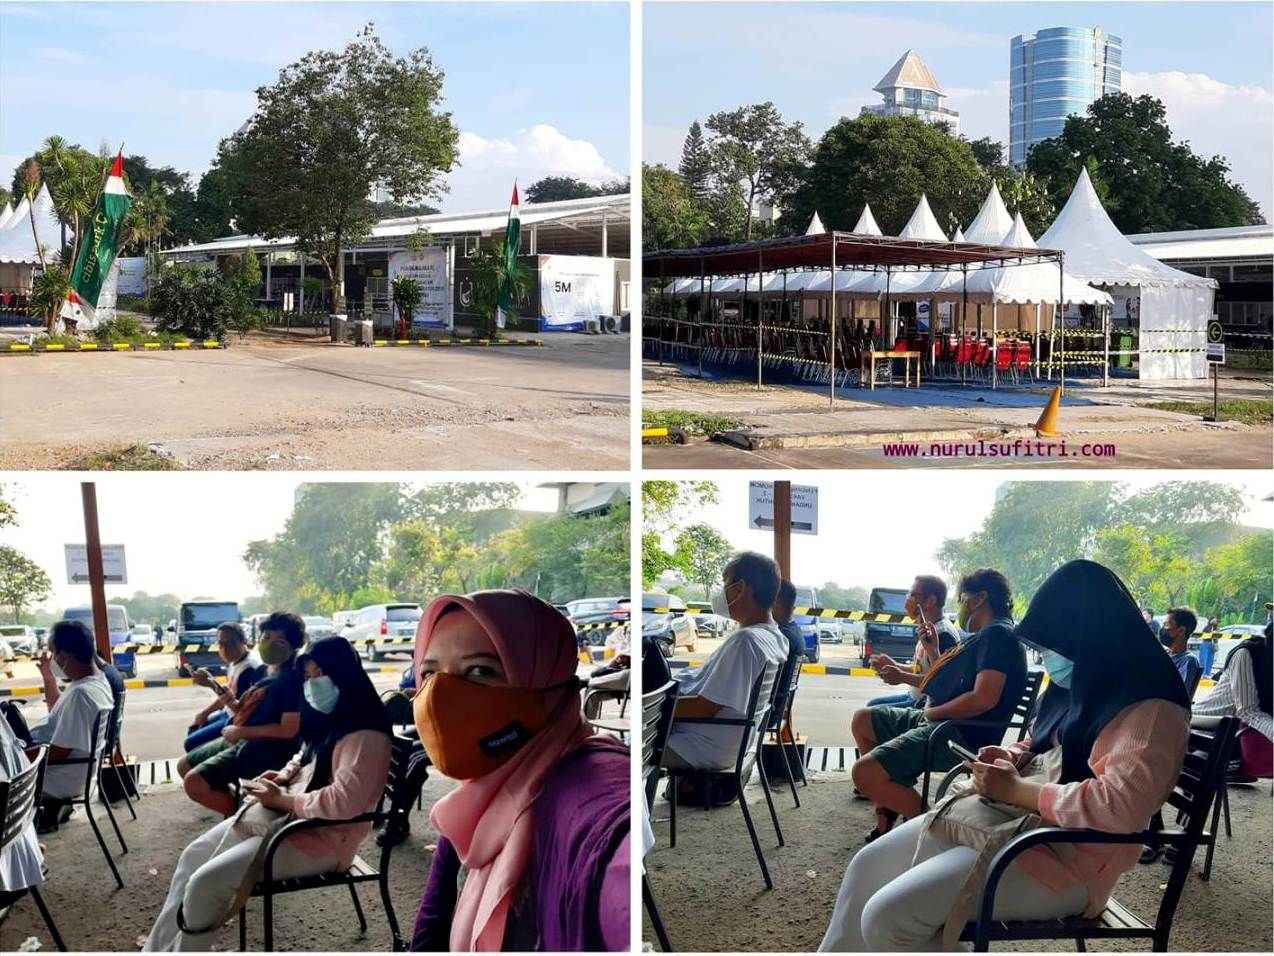 Pengalaman Vaksin SInovac Tahap Dua di Cibis Park Nurul Sufitri Travel Lifestyle Blog